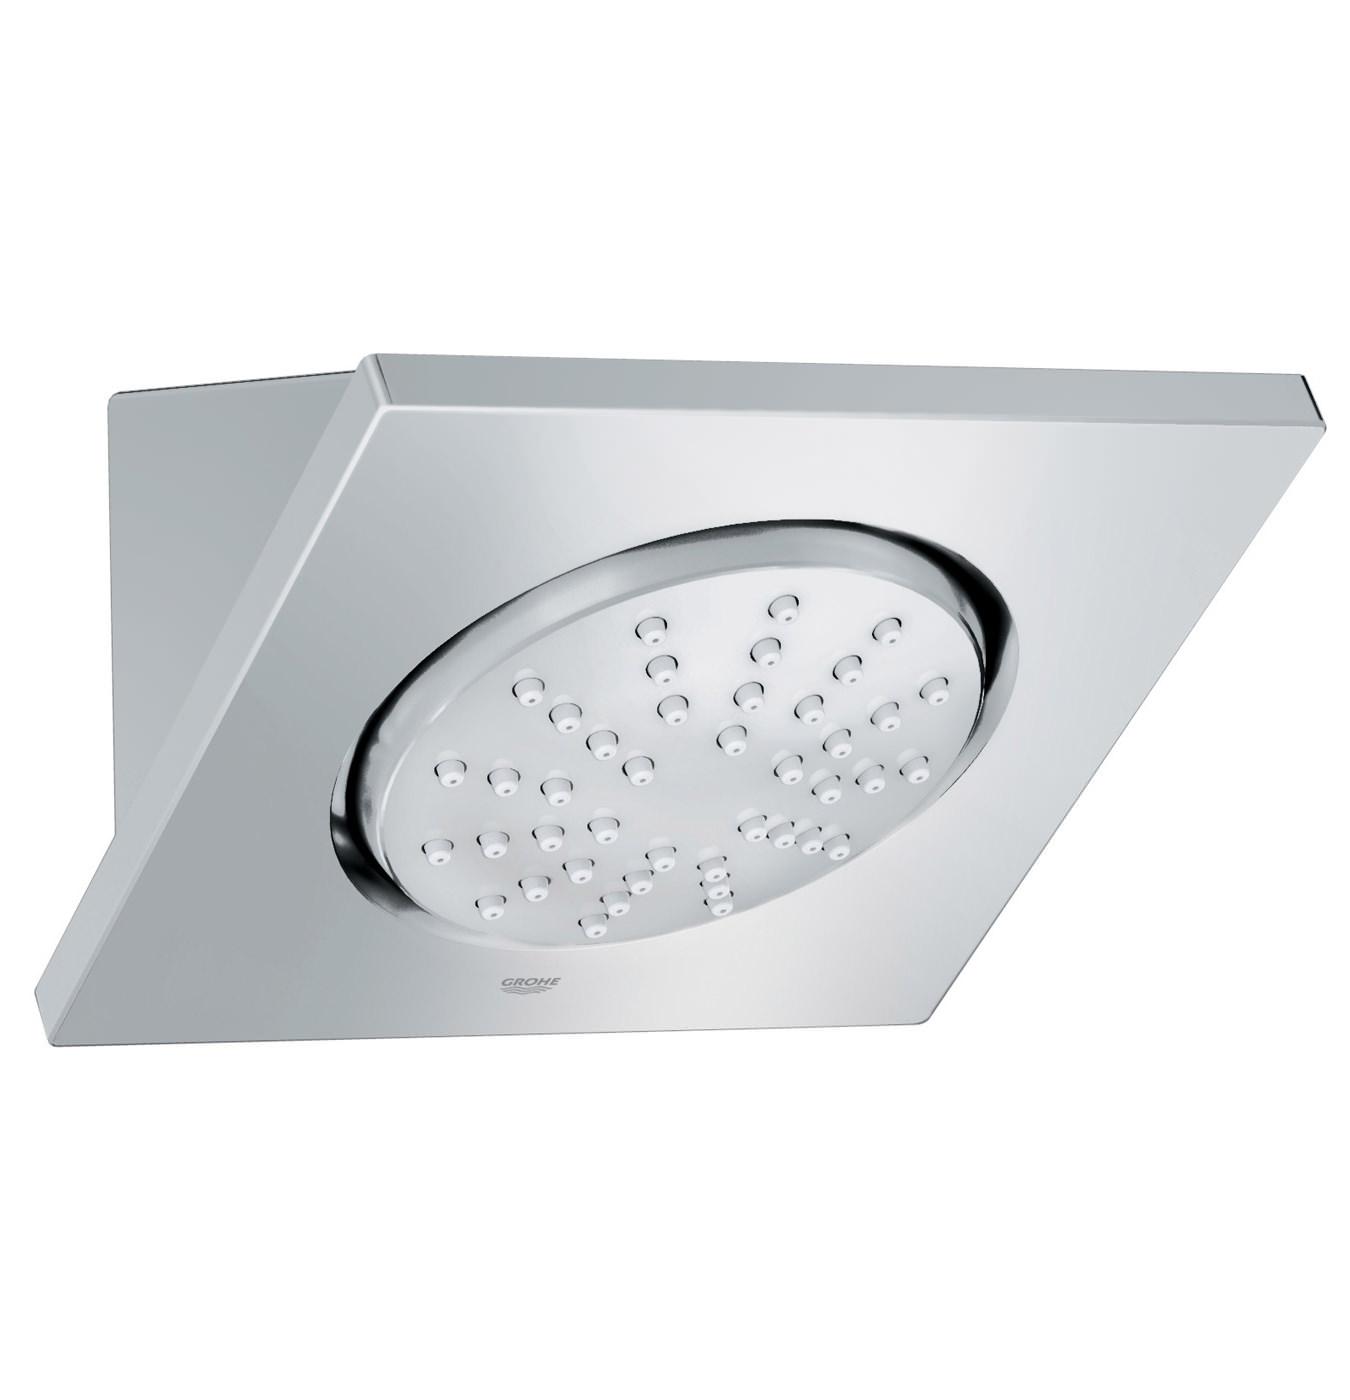 grohe rainshower f series head shower 127mm chrome 27253000. Black Bedroom Furniture Sets. Home Design Ideas